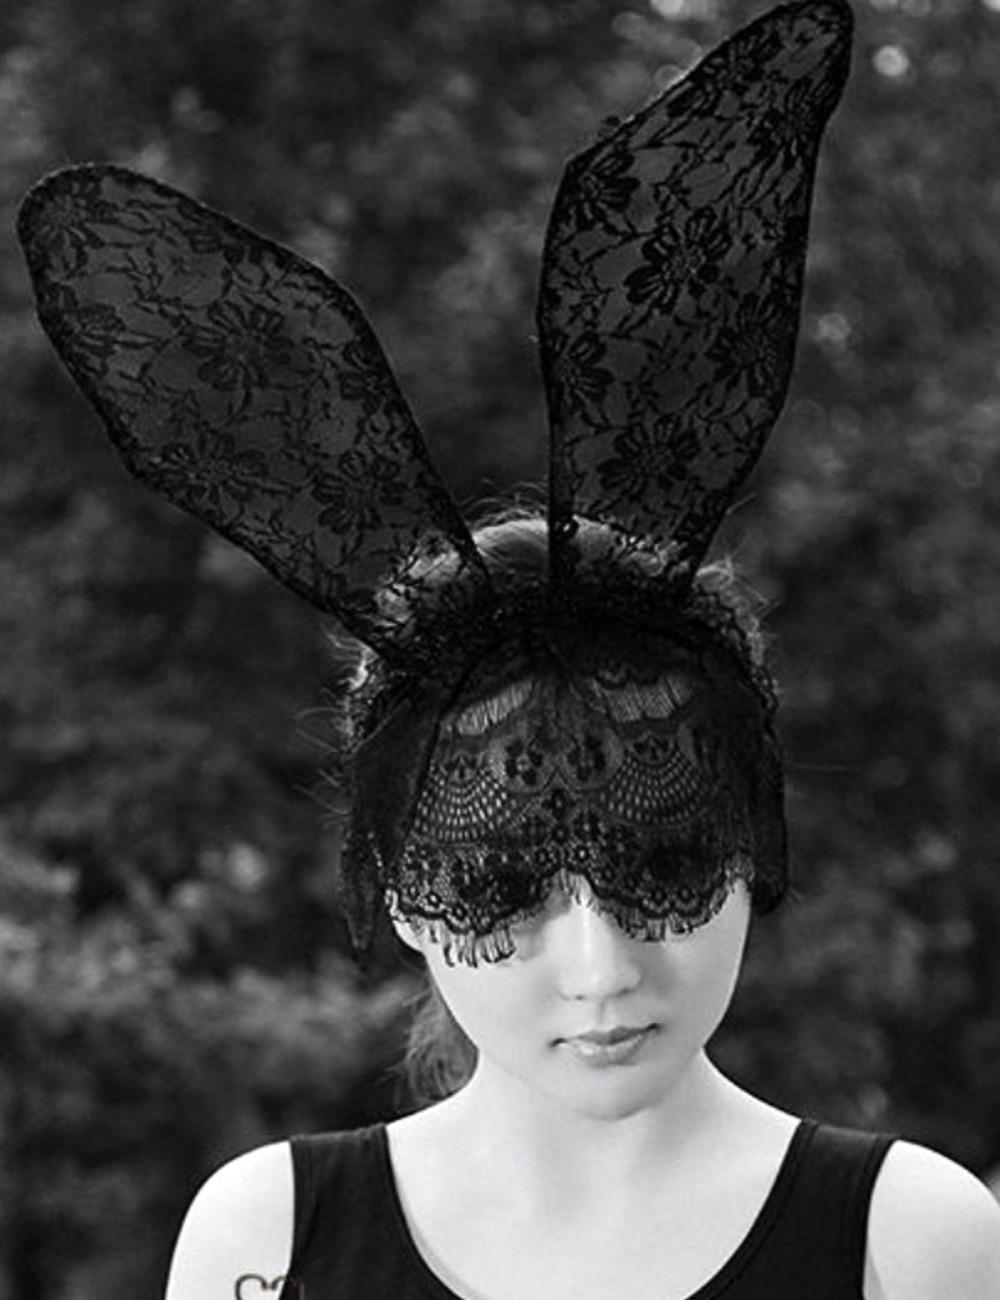 fashion women girl hair bands lace rabbit bunny ears veil black eye mask halloween party headwear - Black Eye Mask Halloween